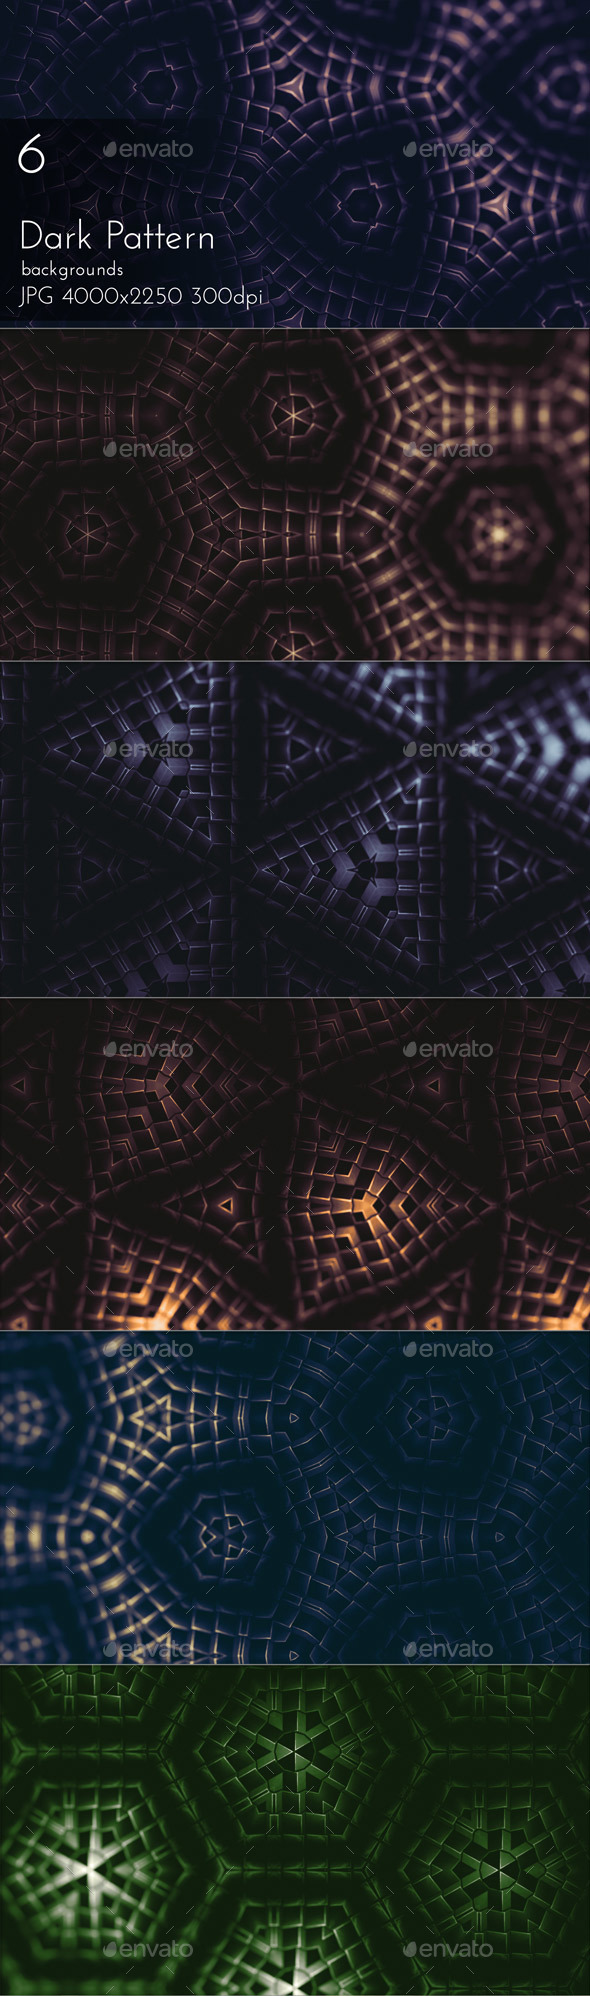 Dark Pattern - Patterns Backgrounds